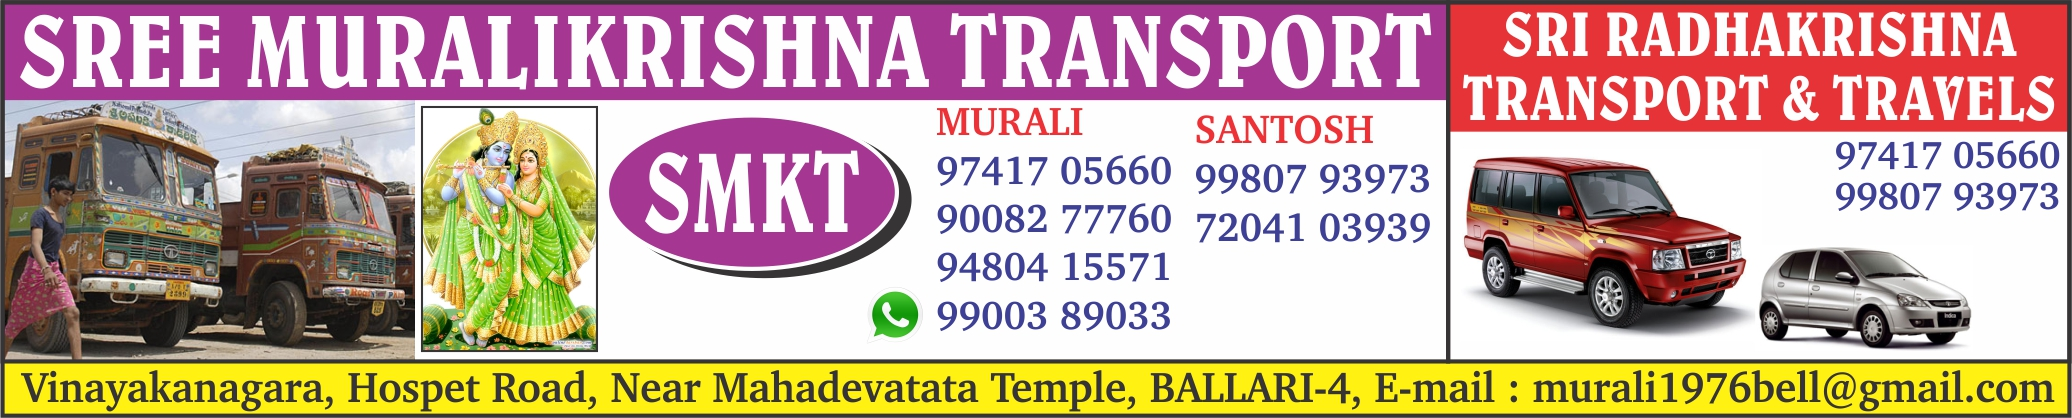 Sri Radhakrishna Transport & Travels